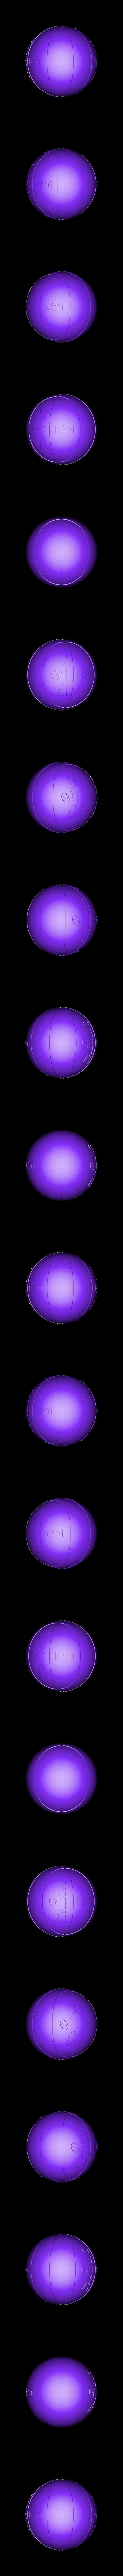 spalding_basketball_1 (1).stl Download free STL file Spalding Basketball • 3D printable model, Mathi_